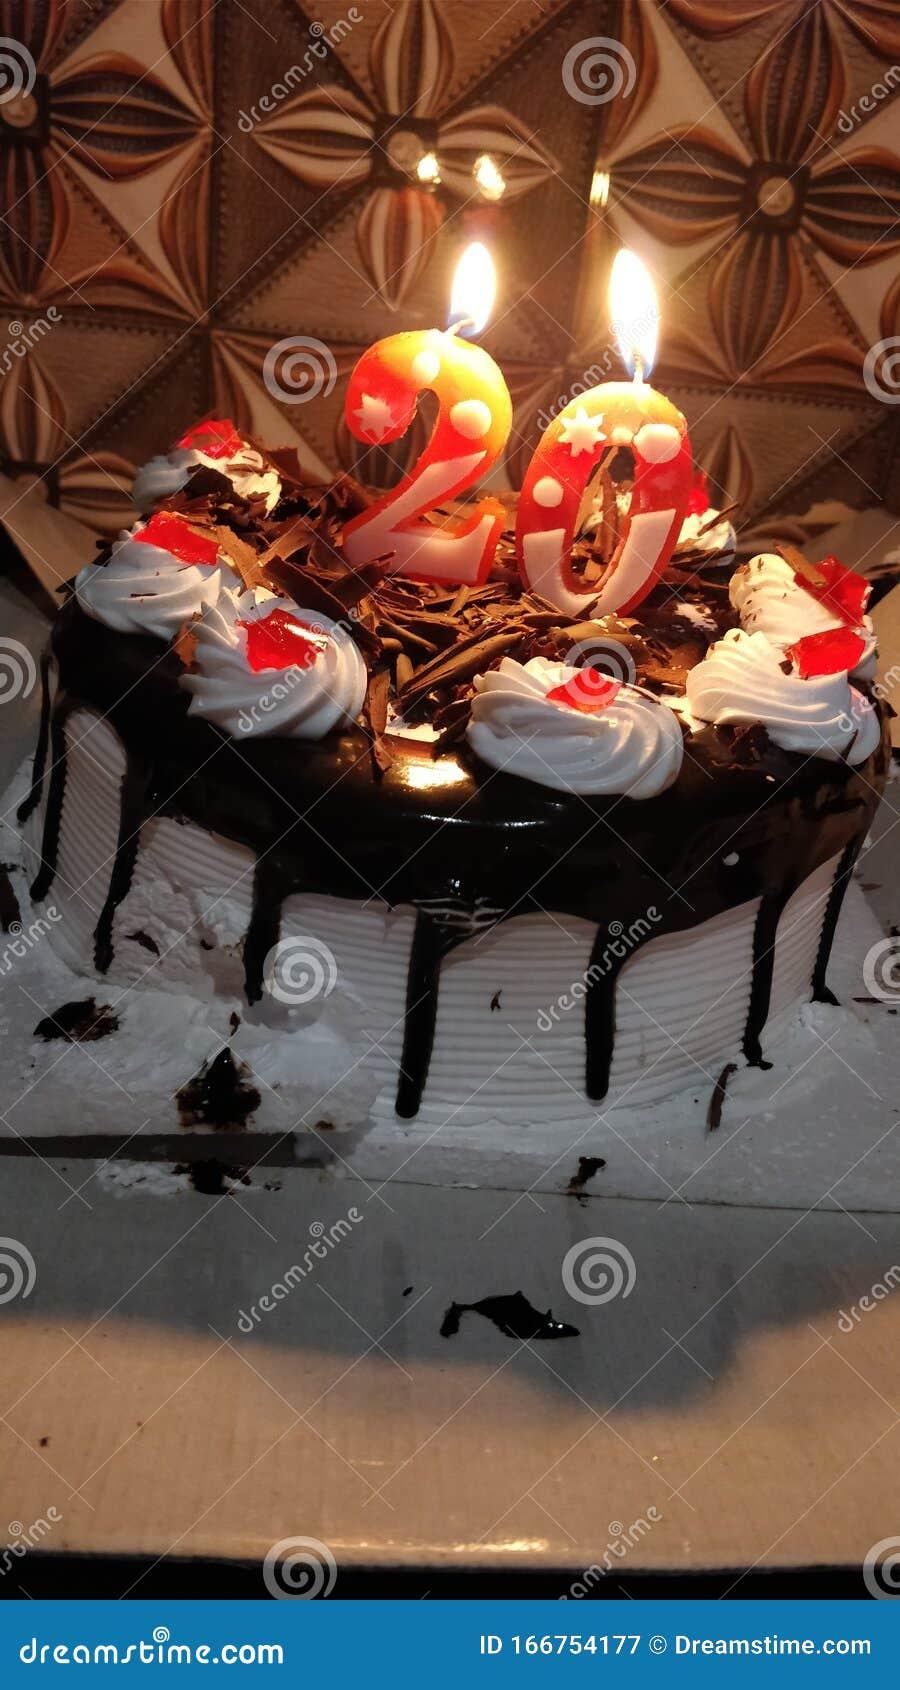 Swell Birthday Cake Pics Stock Image Image Of Cake Pics 166754177 Personalised Birthday Cards Arneslily Jamesorg